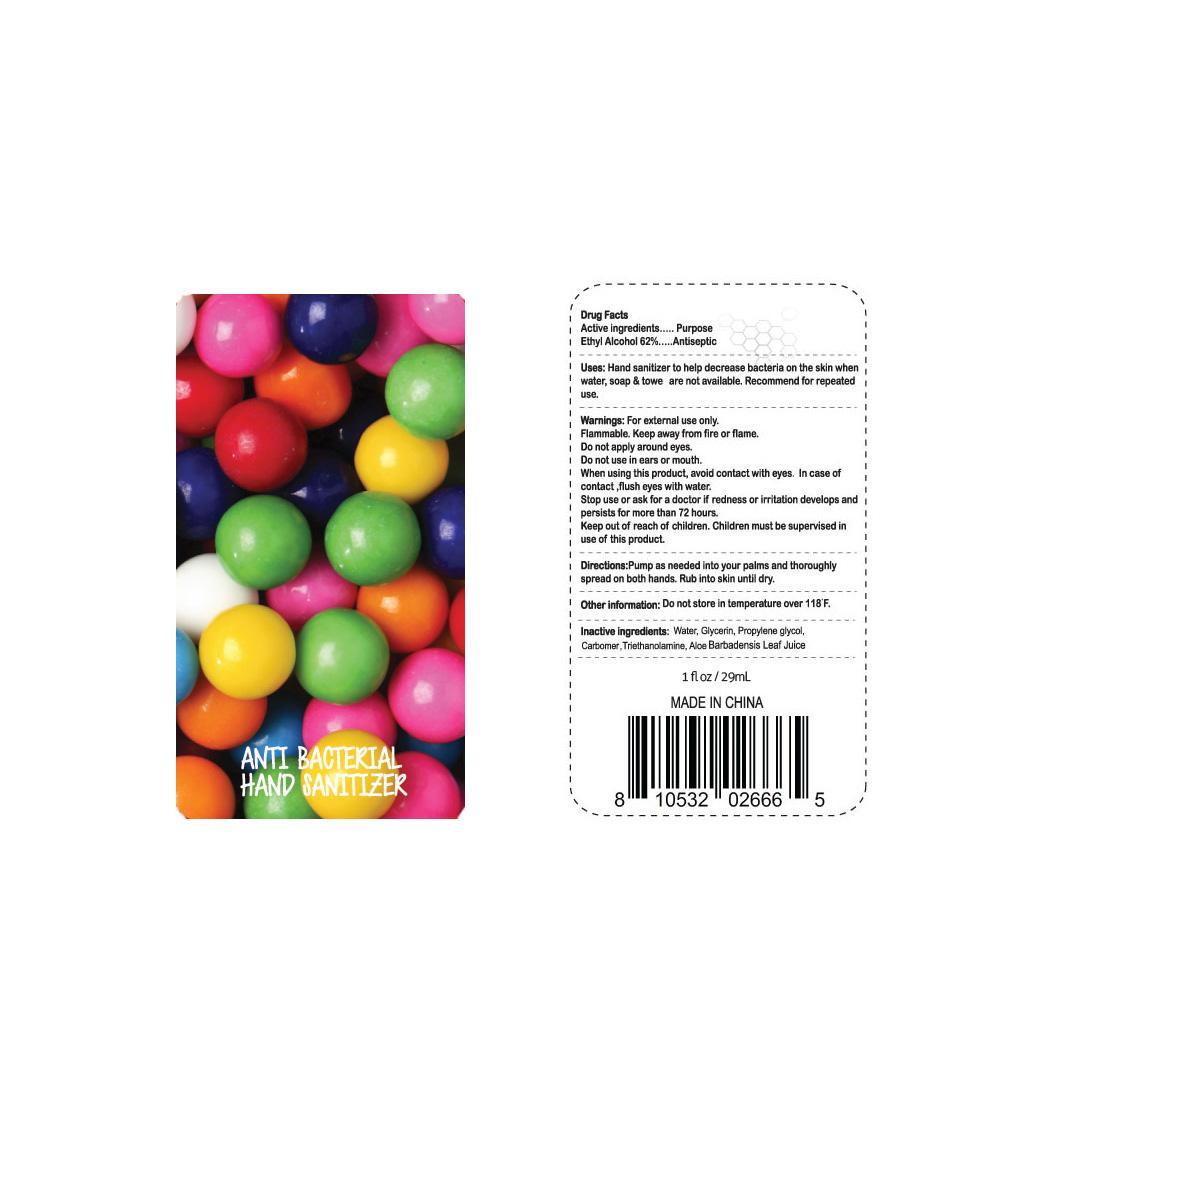 Anti Bacterial Hand Sanitizer (Ethyl Alcohol) Gel [Dolgencorp Inc.]